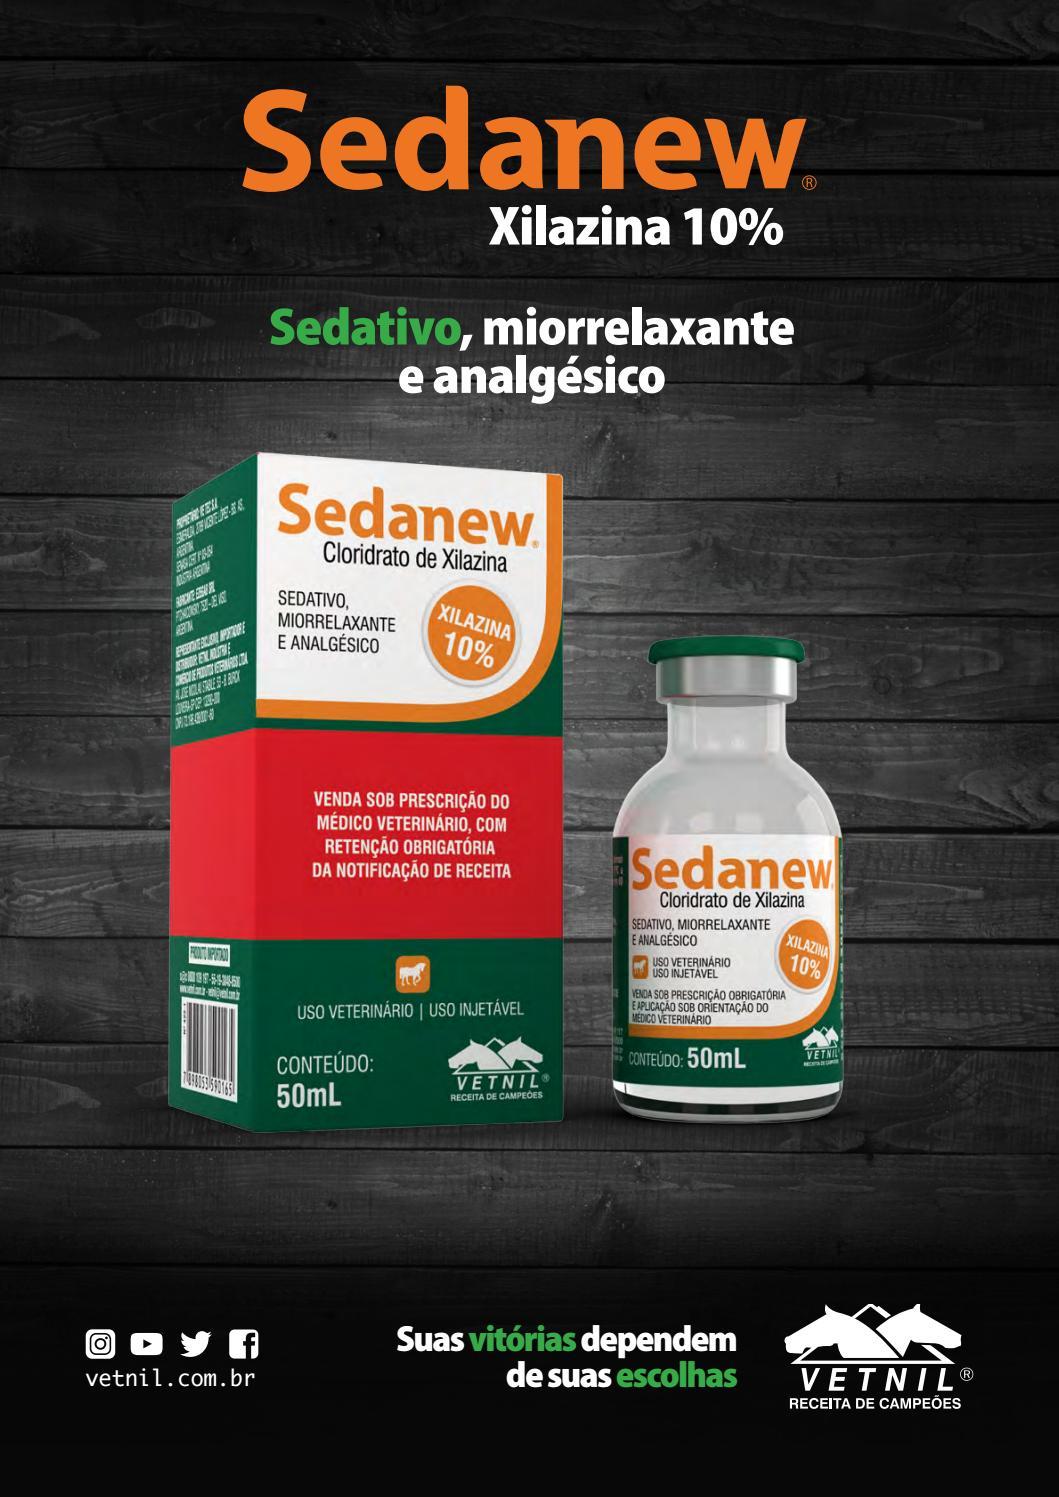 Sedativo iorrelaxante Sedanew® (Xilazina 10%)